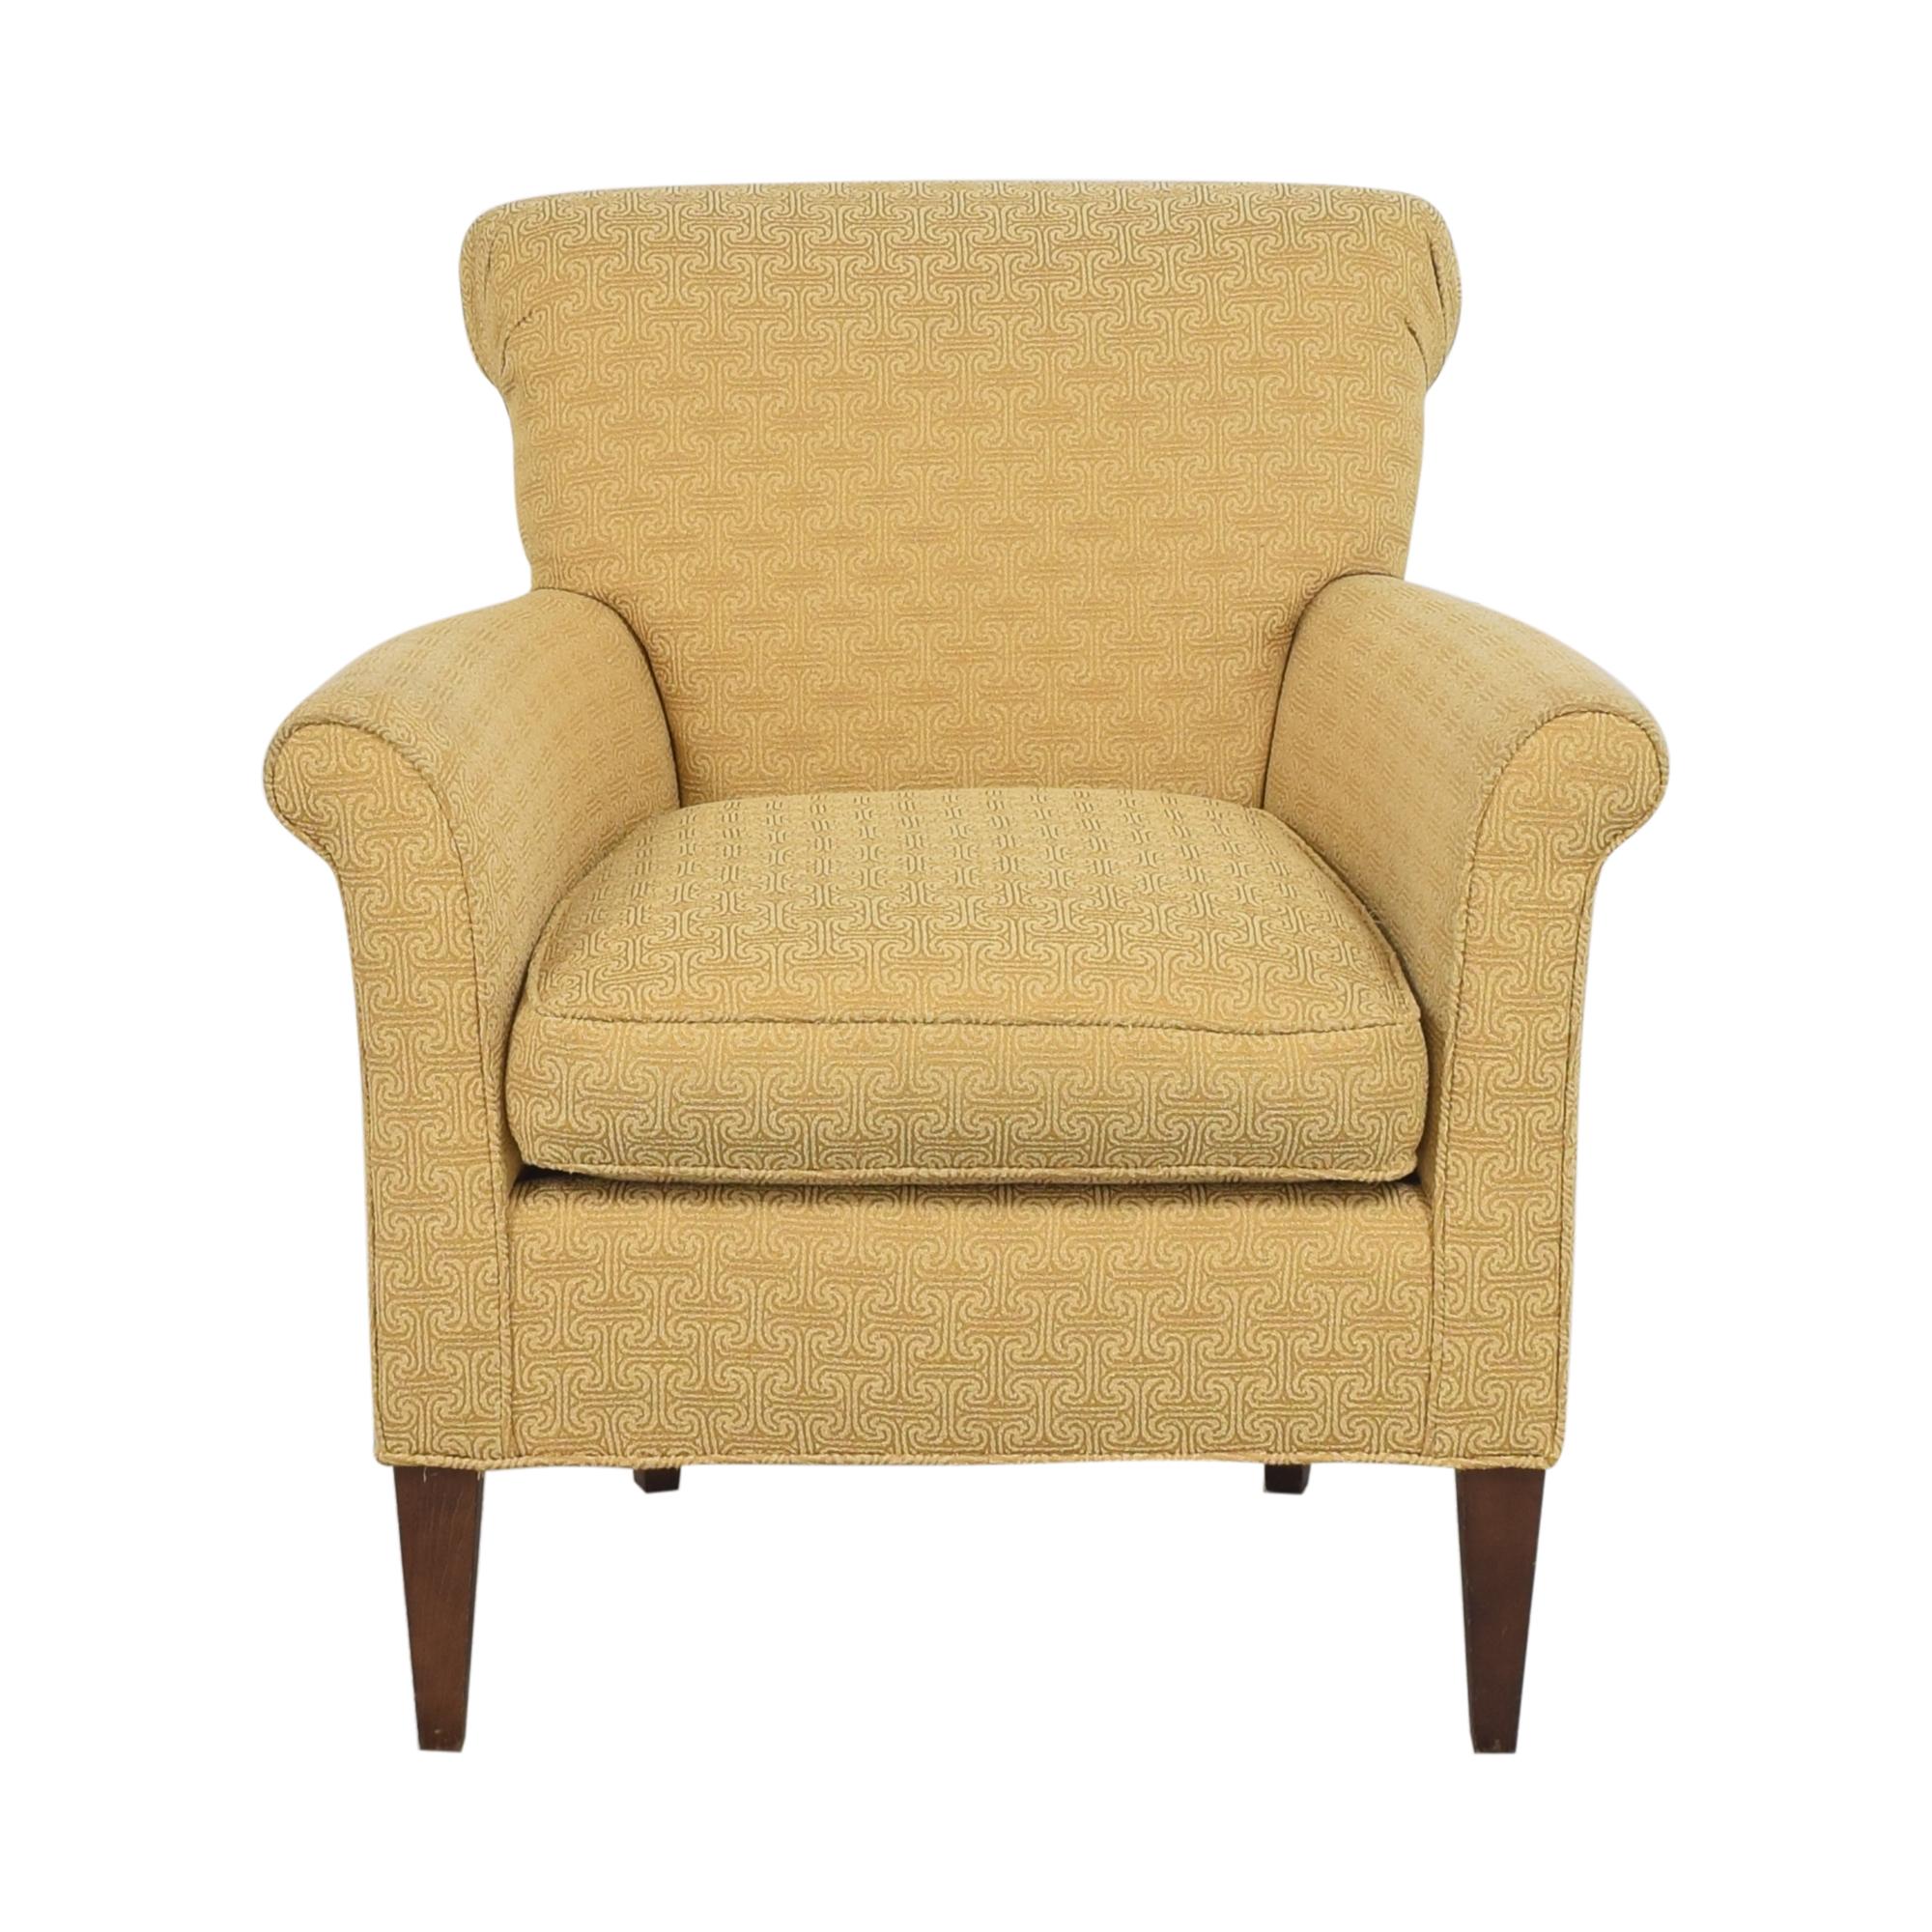 Ethan Allen Ethan Allen Scroll Back Accent Chair Chairs